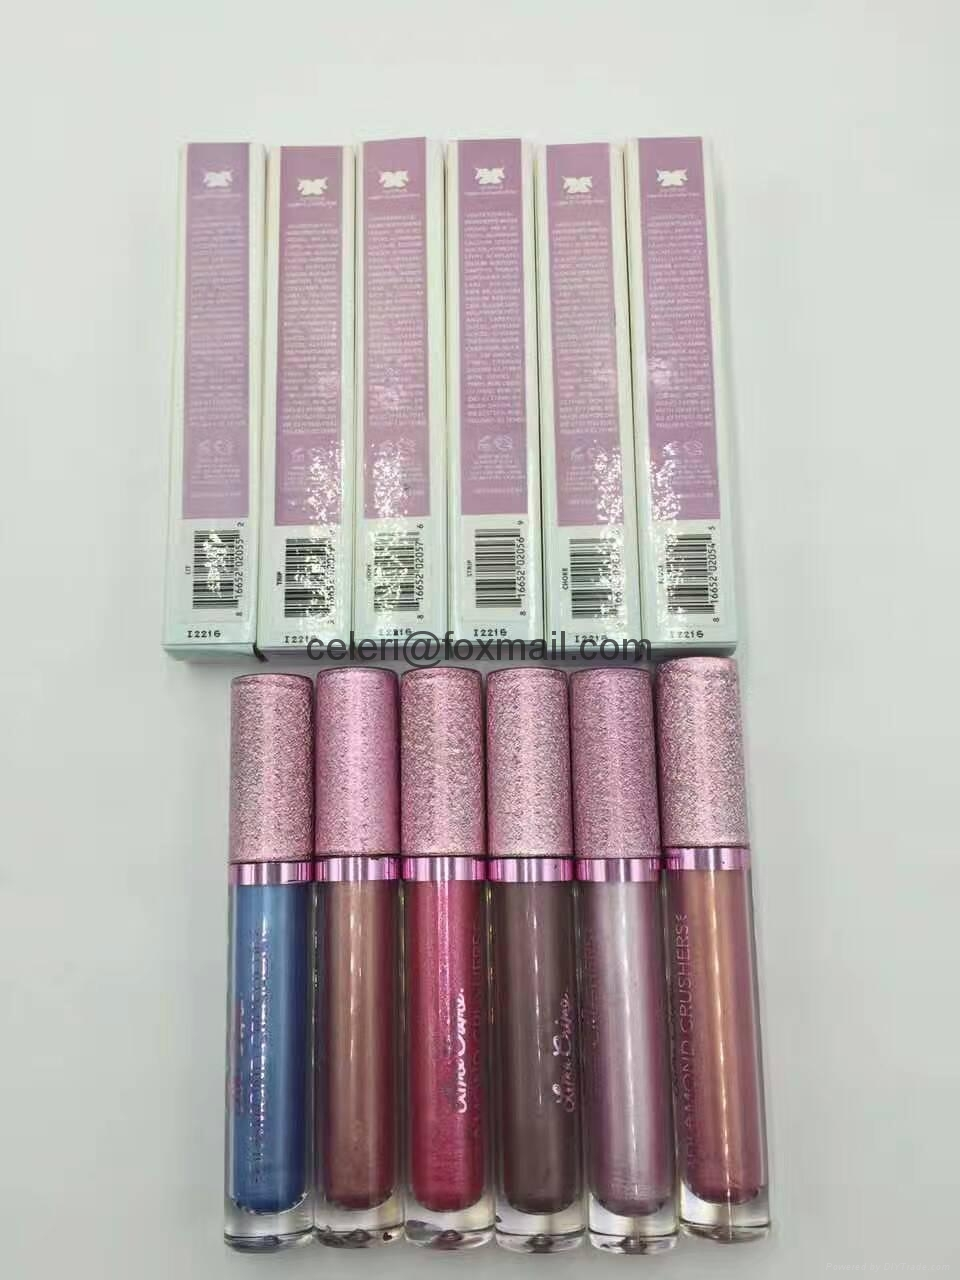 Matte Velvetines: Velvetines Liquid Matte Lipstick 6 Colors